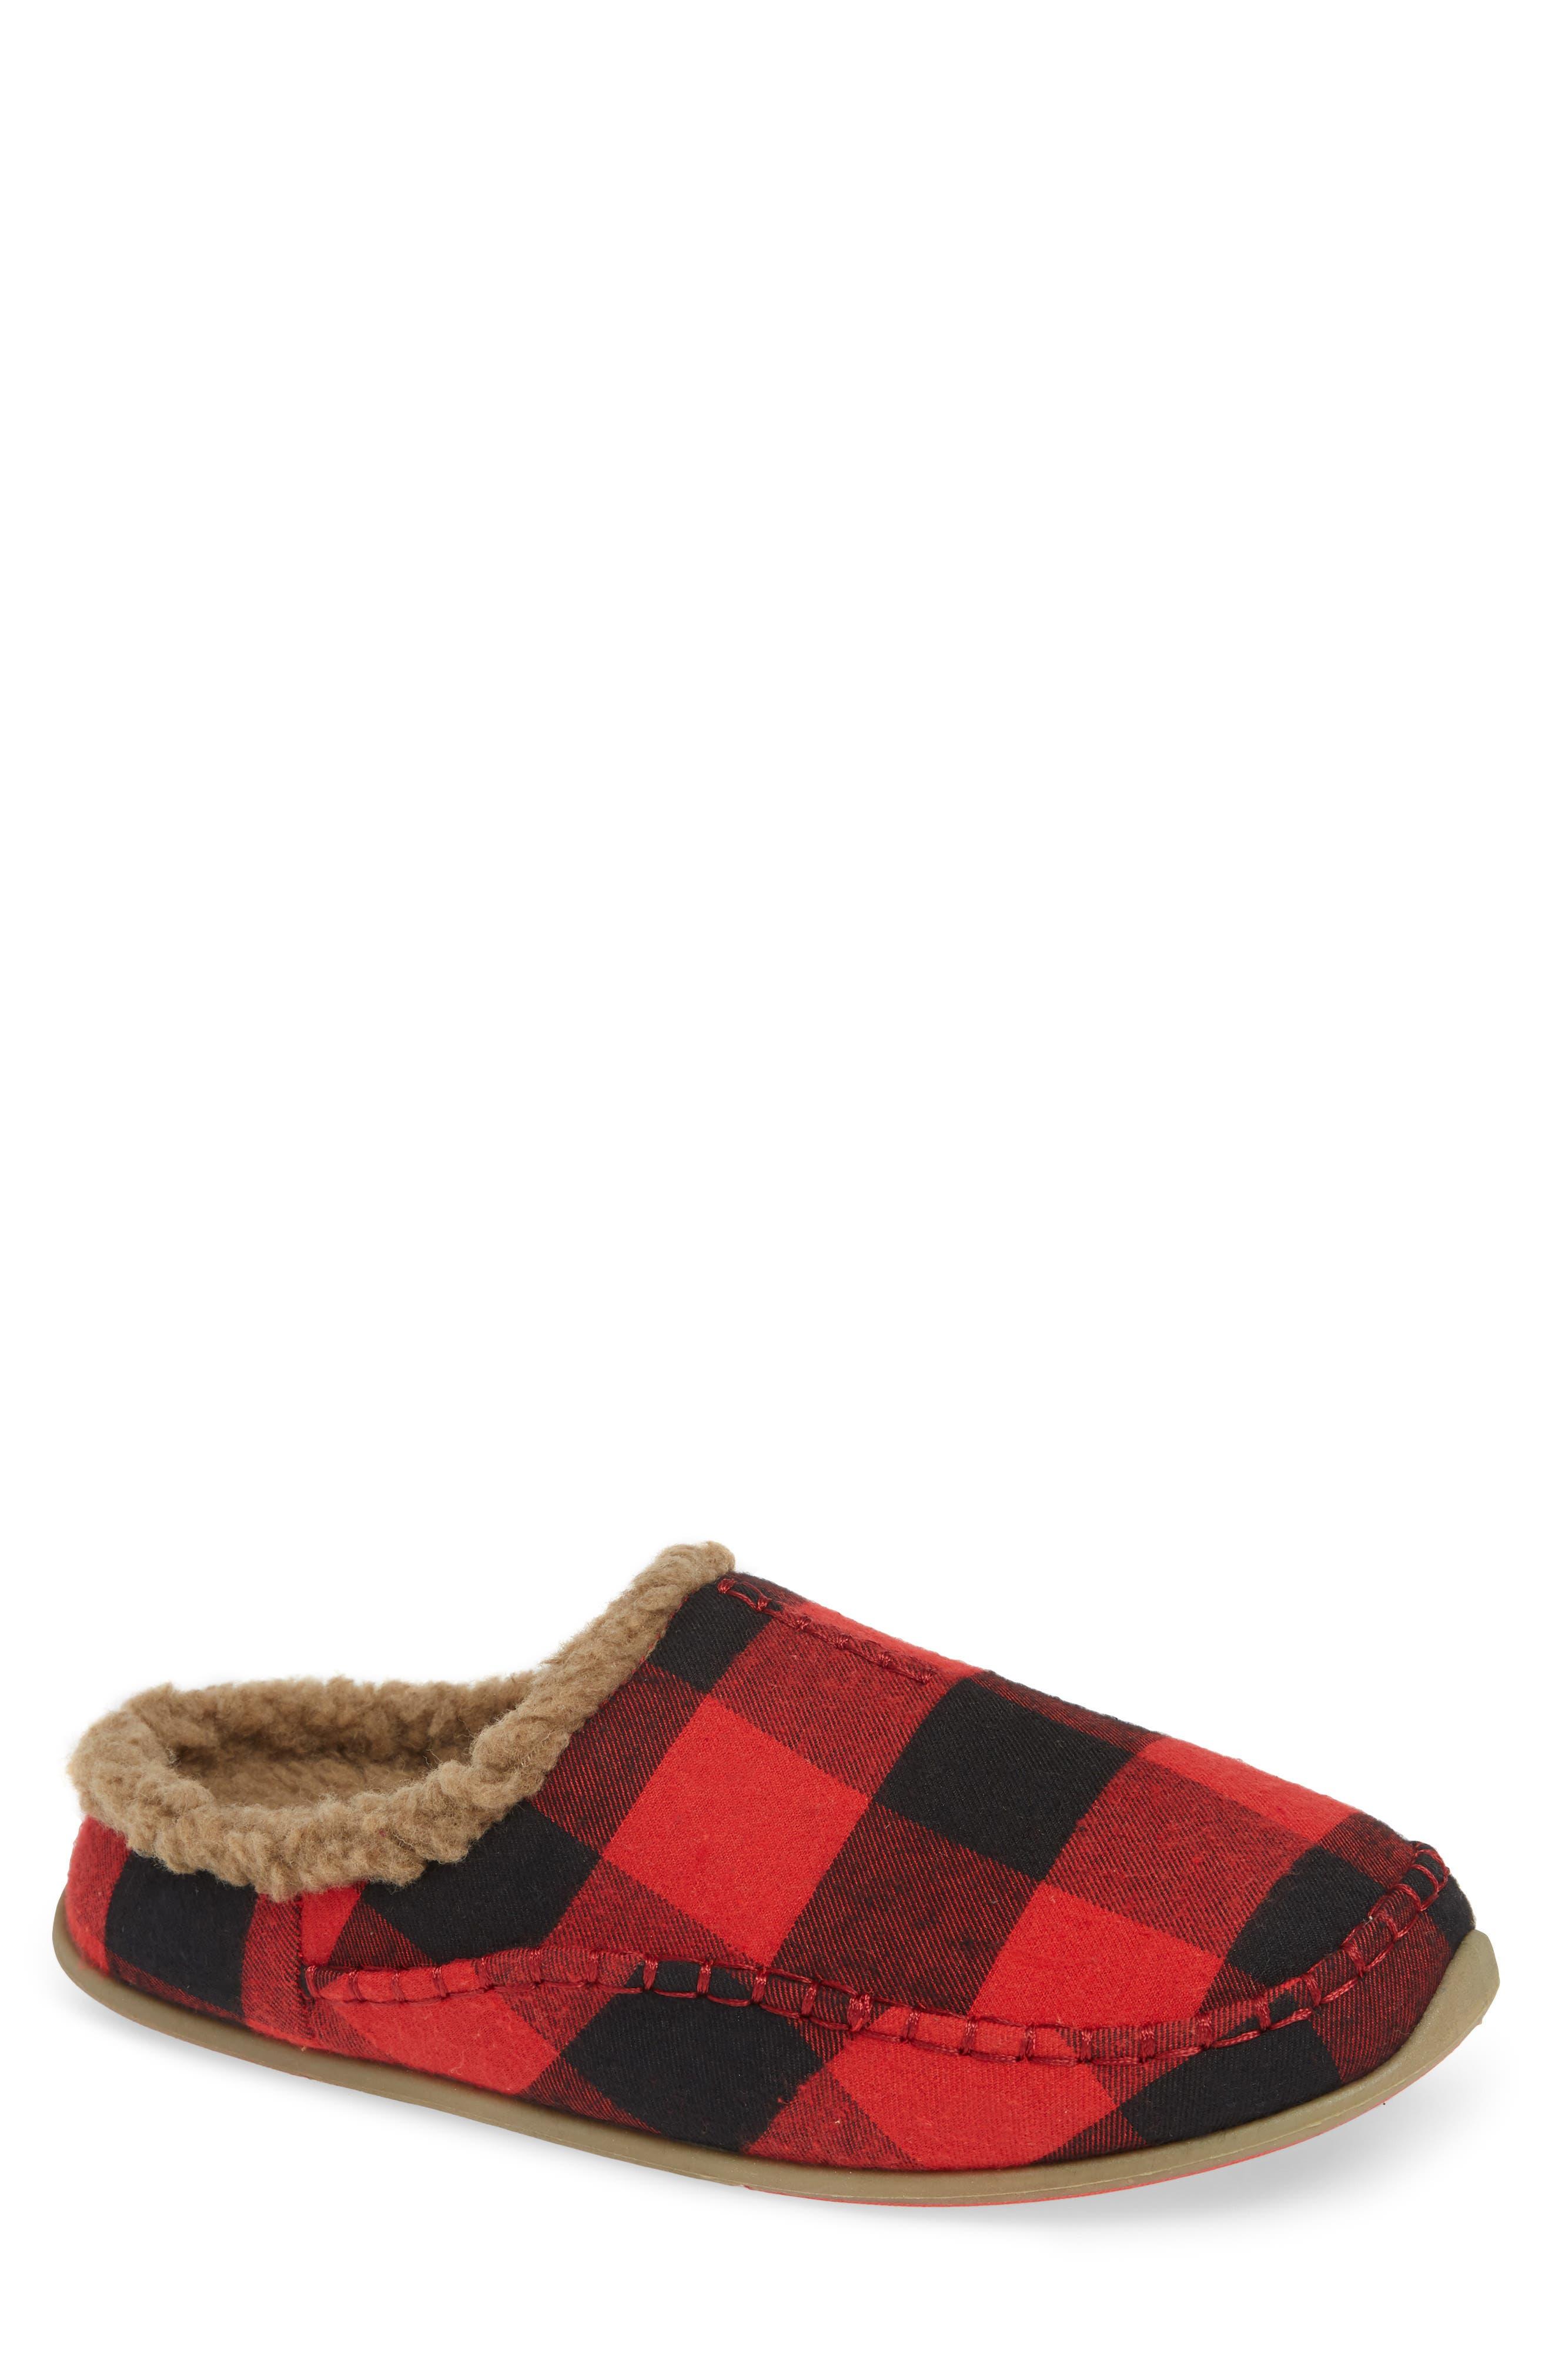 Nordic Slipper